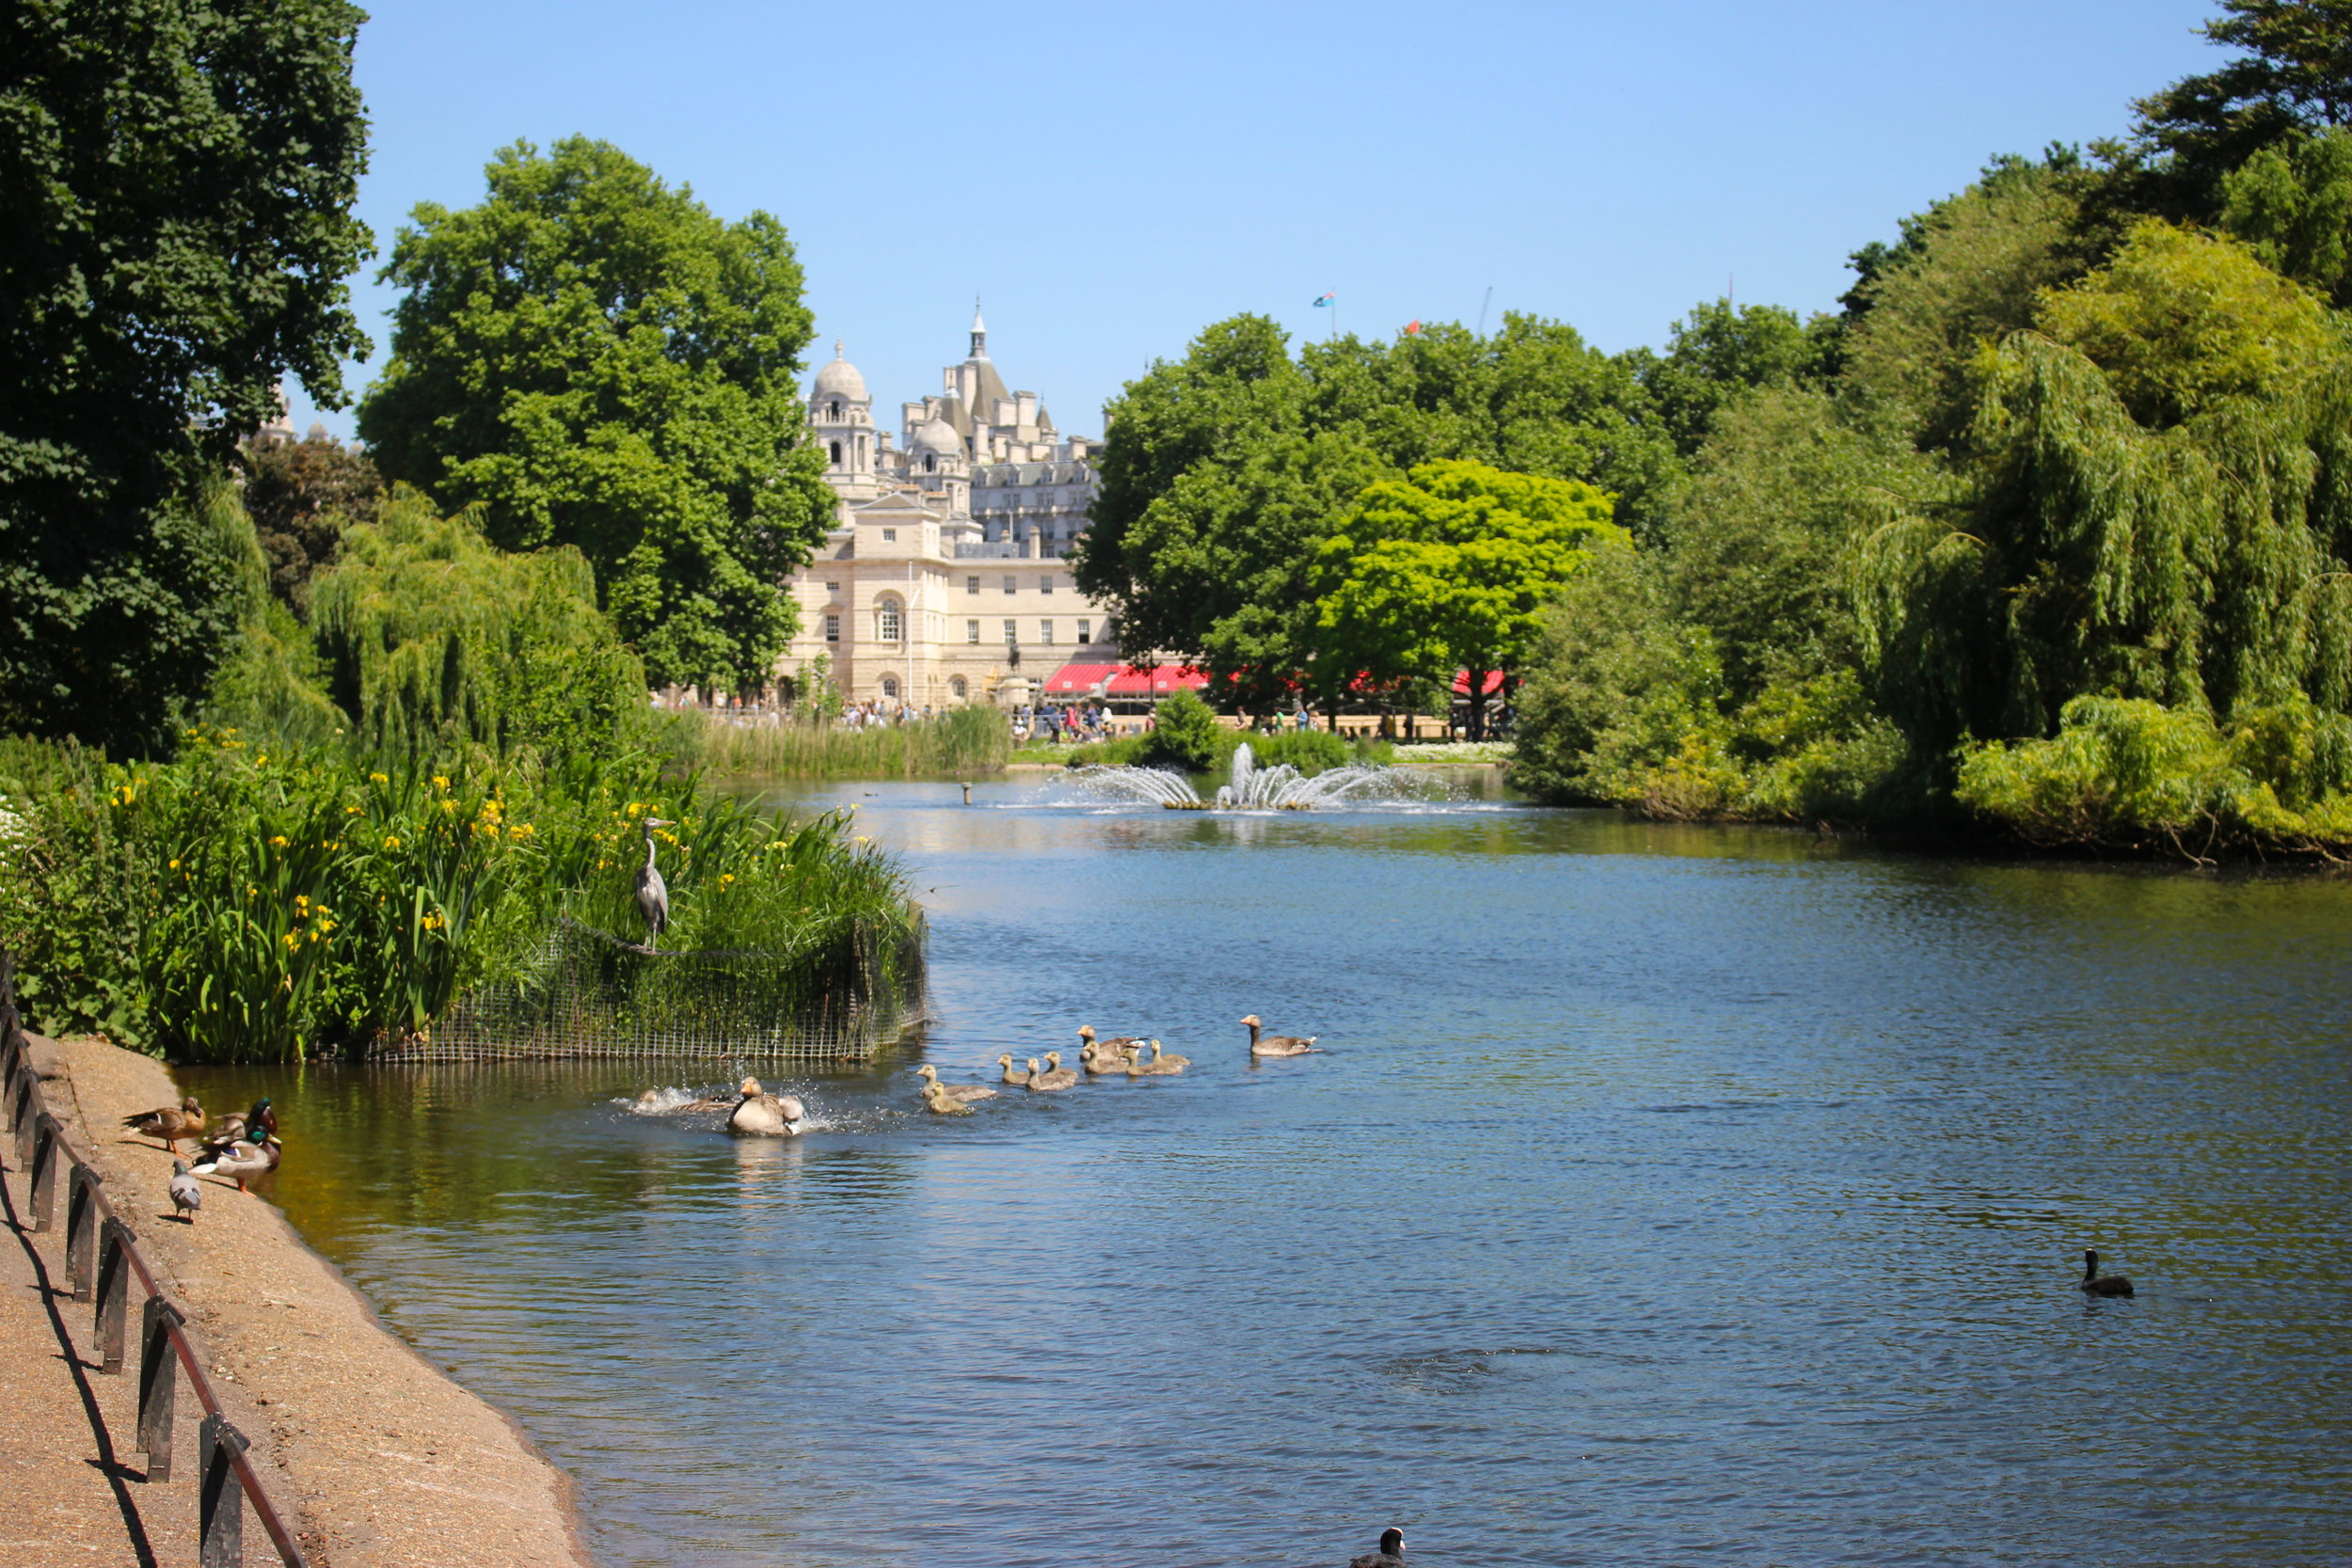 St. James's Park and Buckingham Palace